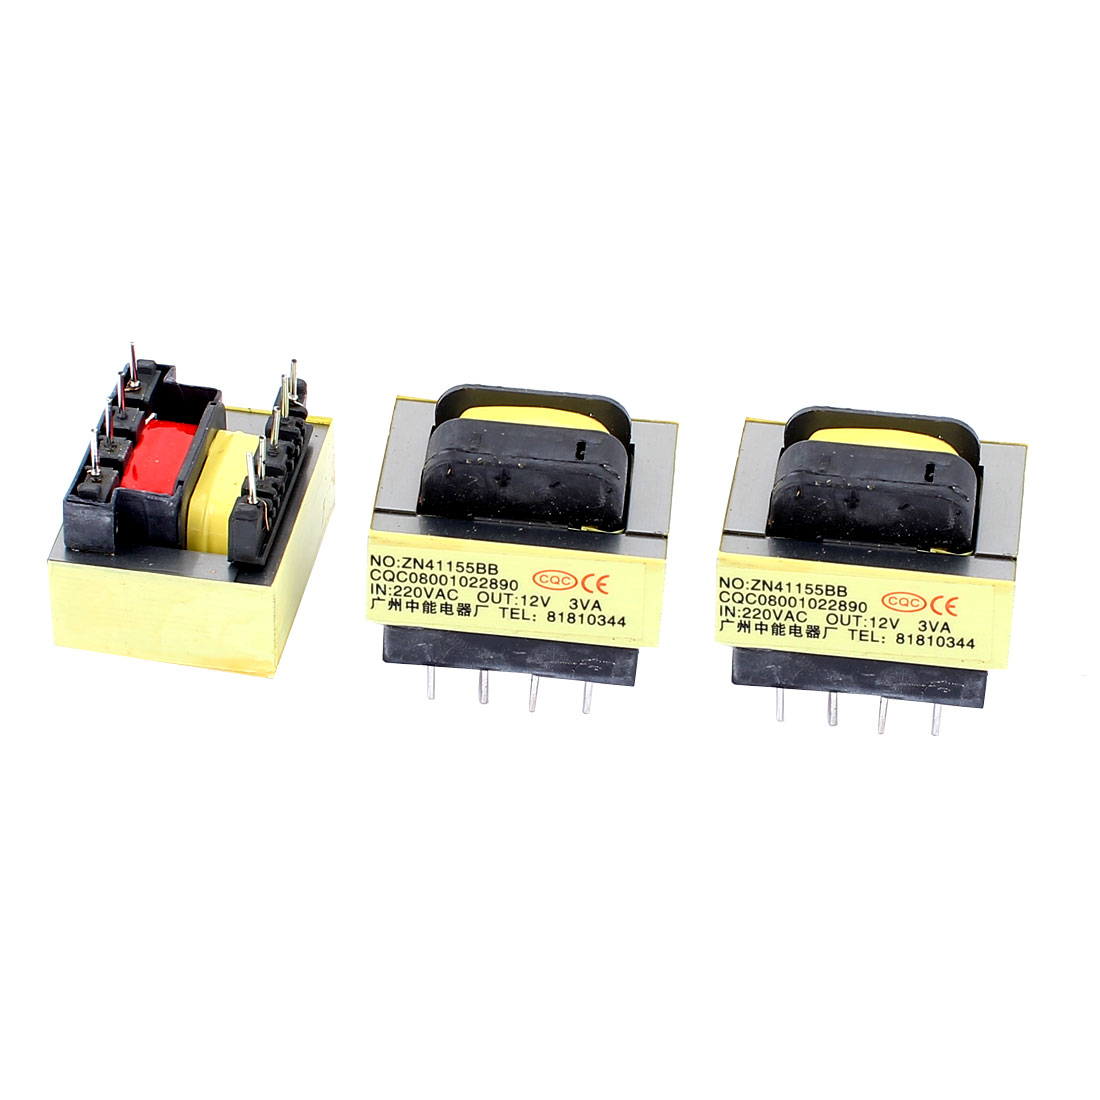 3Pcs 220V Input 12V 3VA Output Yellow Red Ferrite Core Power Transformer w 5 Terminals